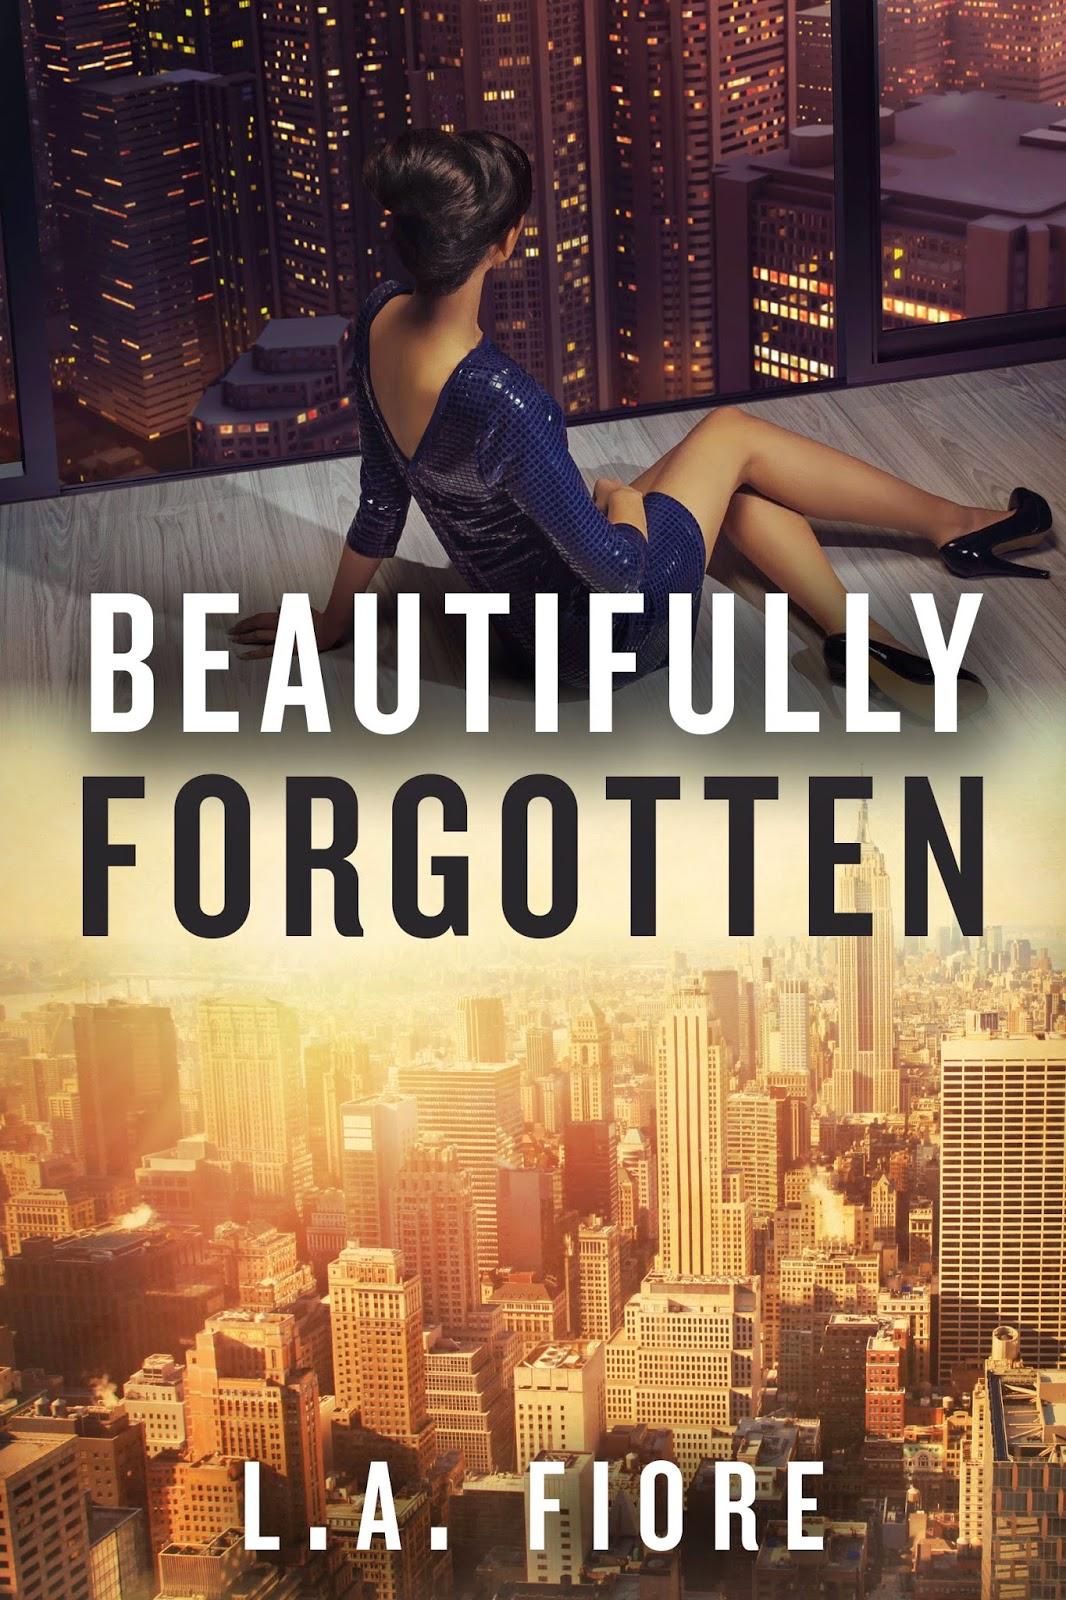 Title: Beautifully Forgotten